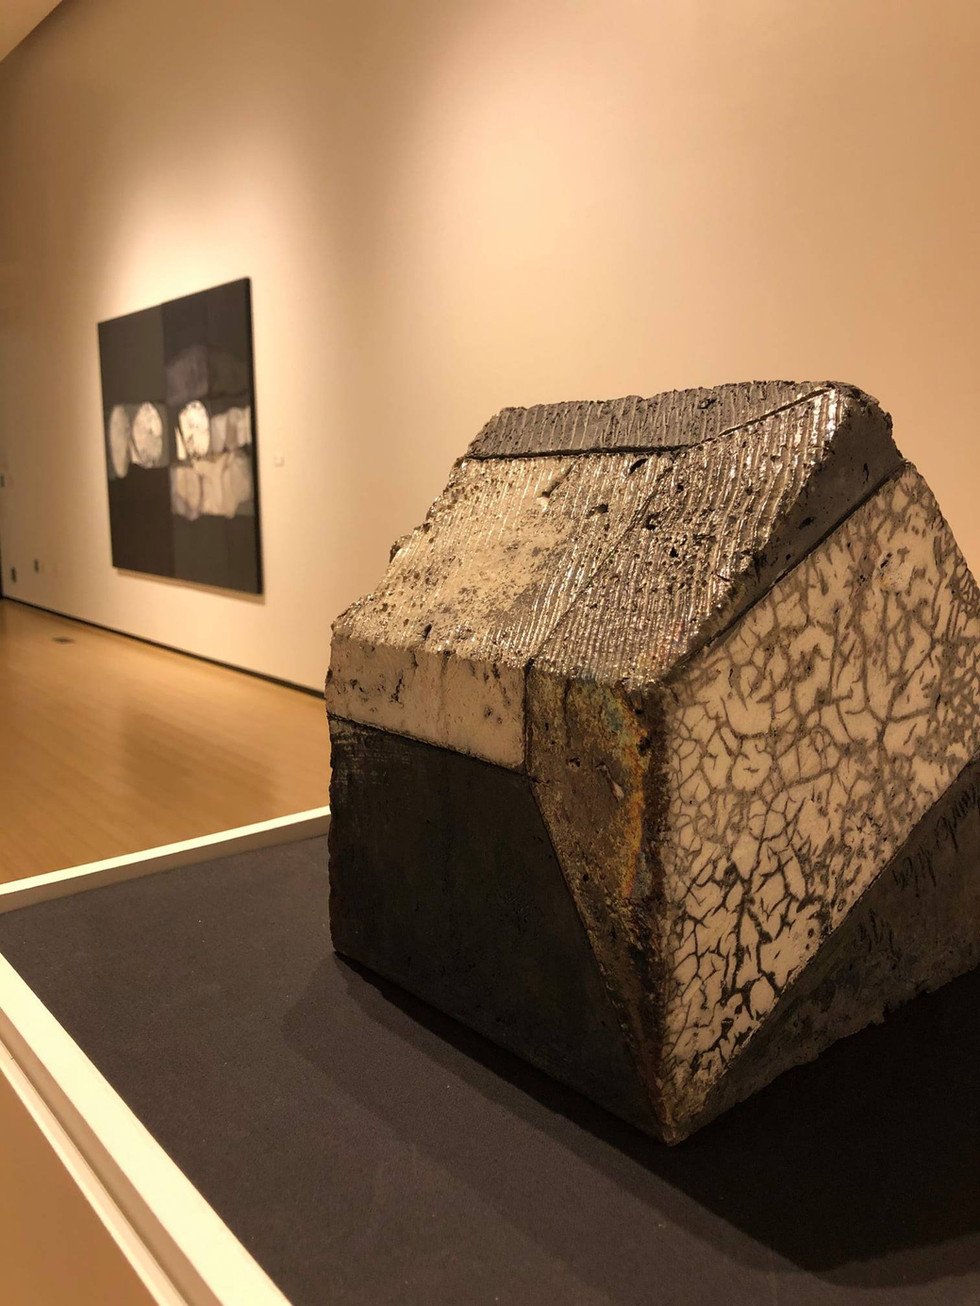 Phil VanderWeg. Untitled (House). 1998. Ceramic.